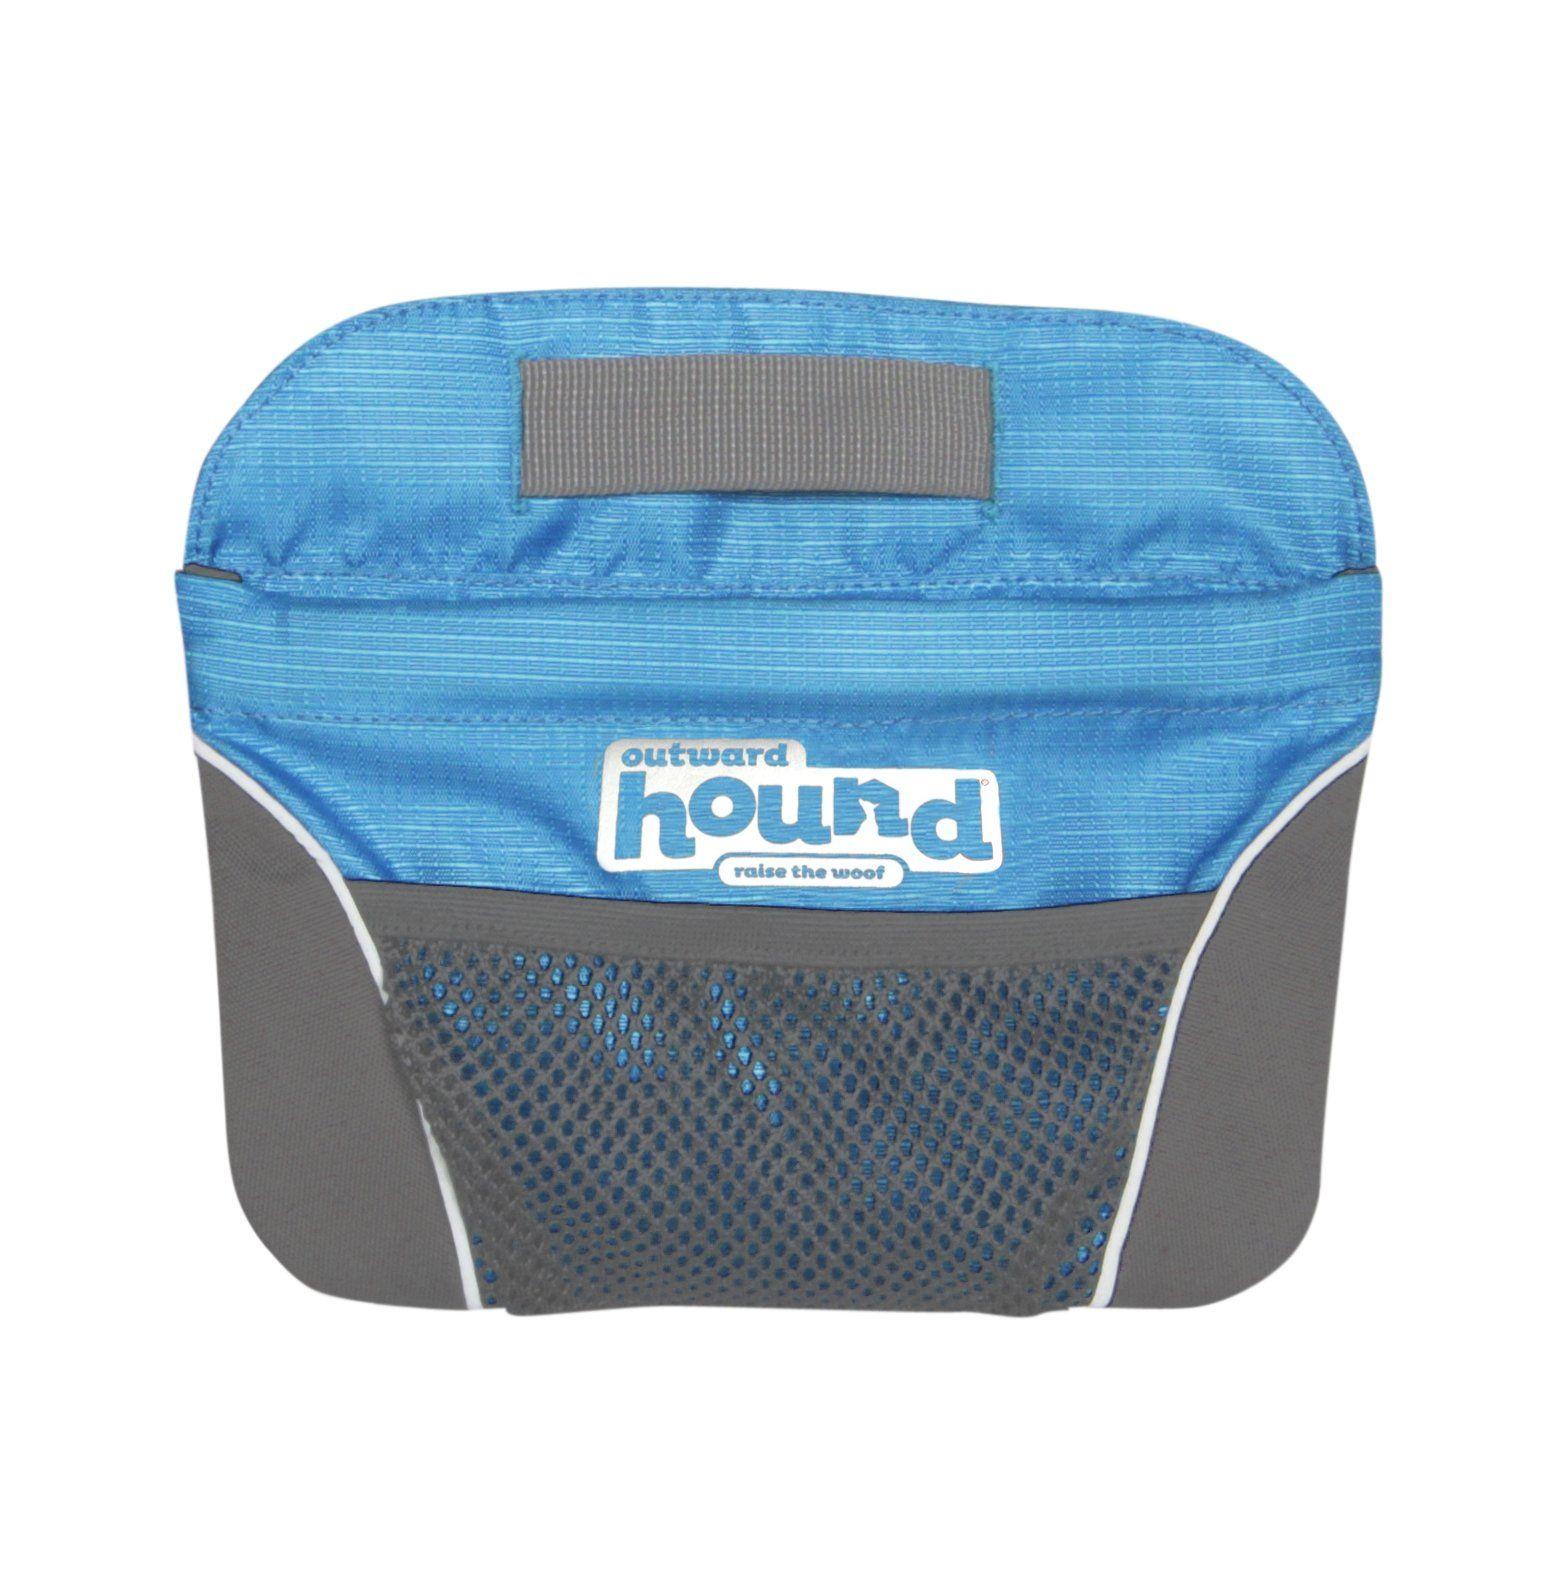 Outward hound treatbag quick access blue dog treat